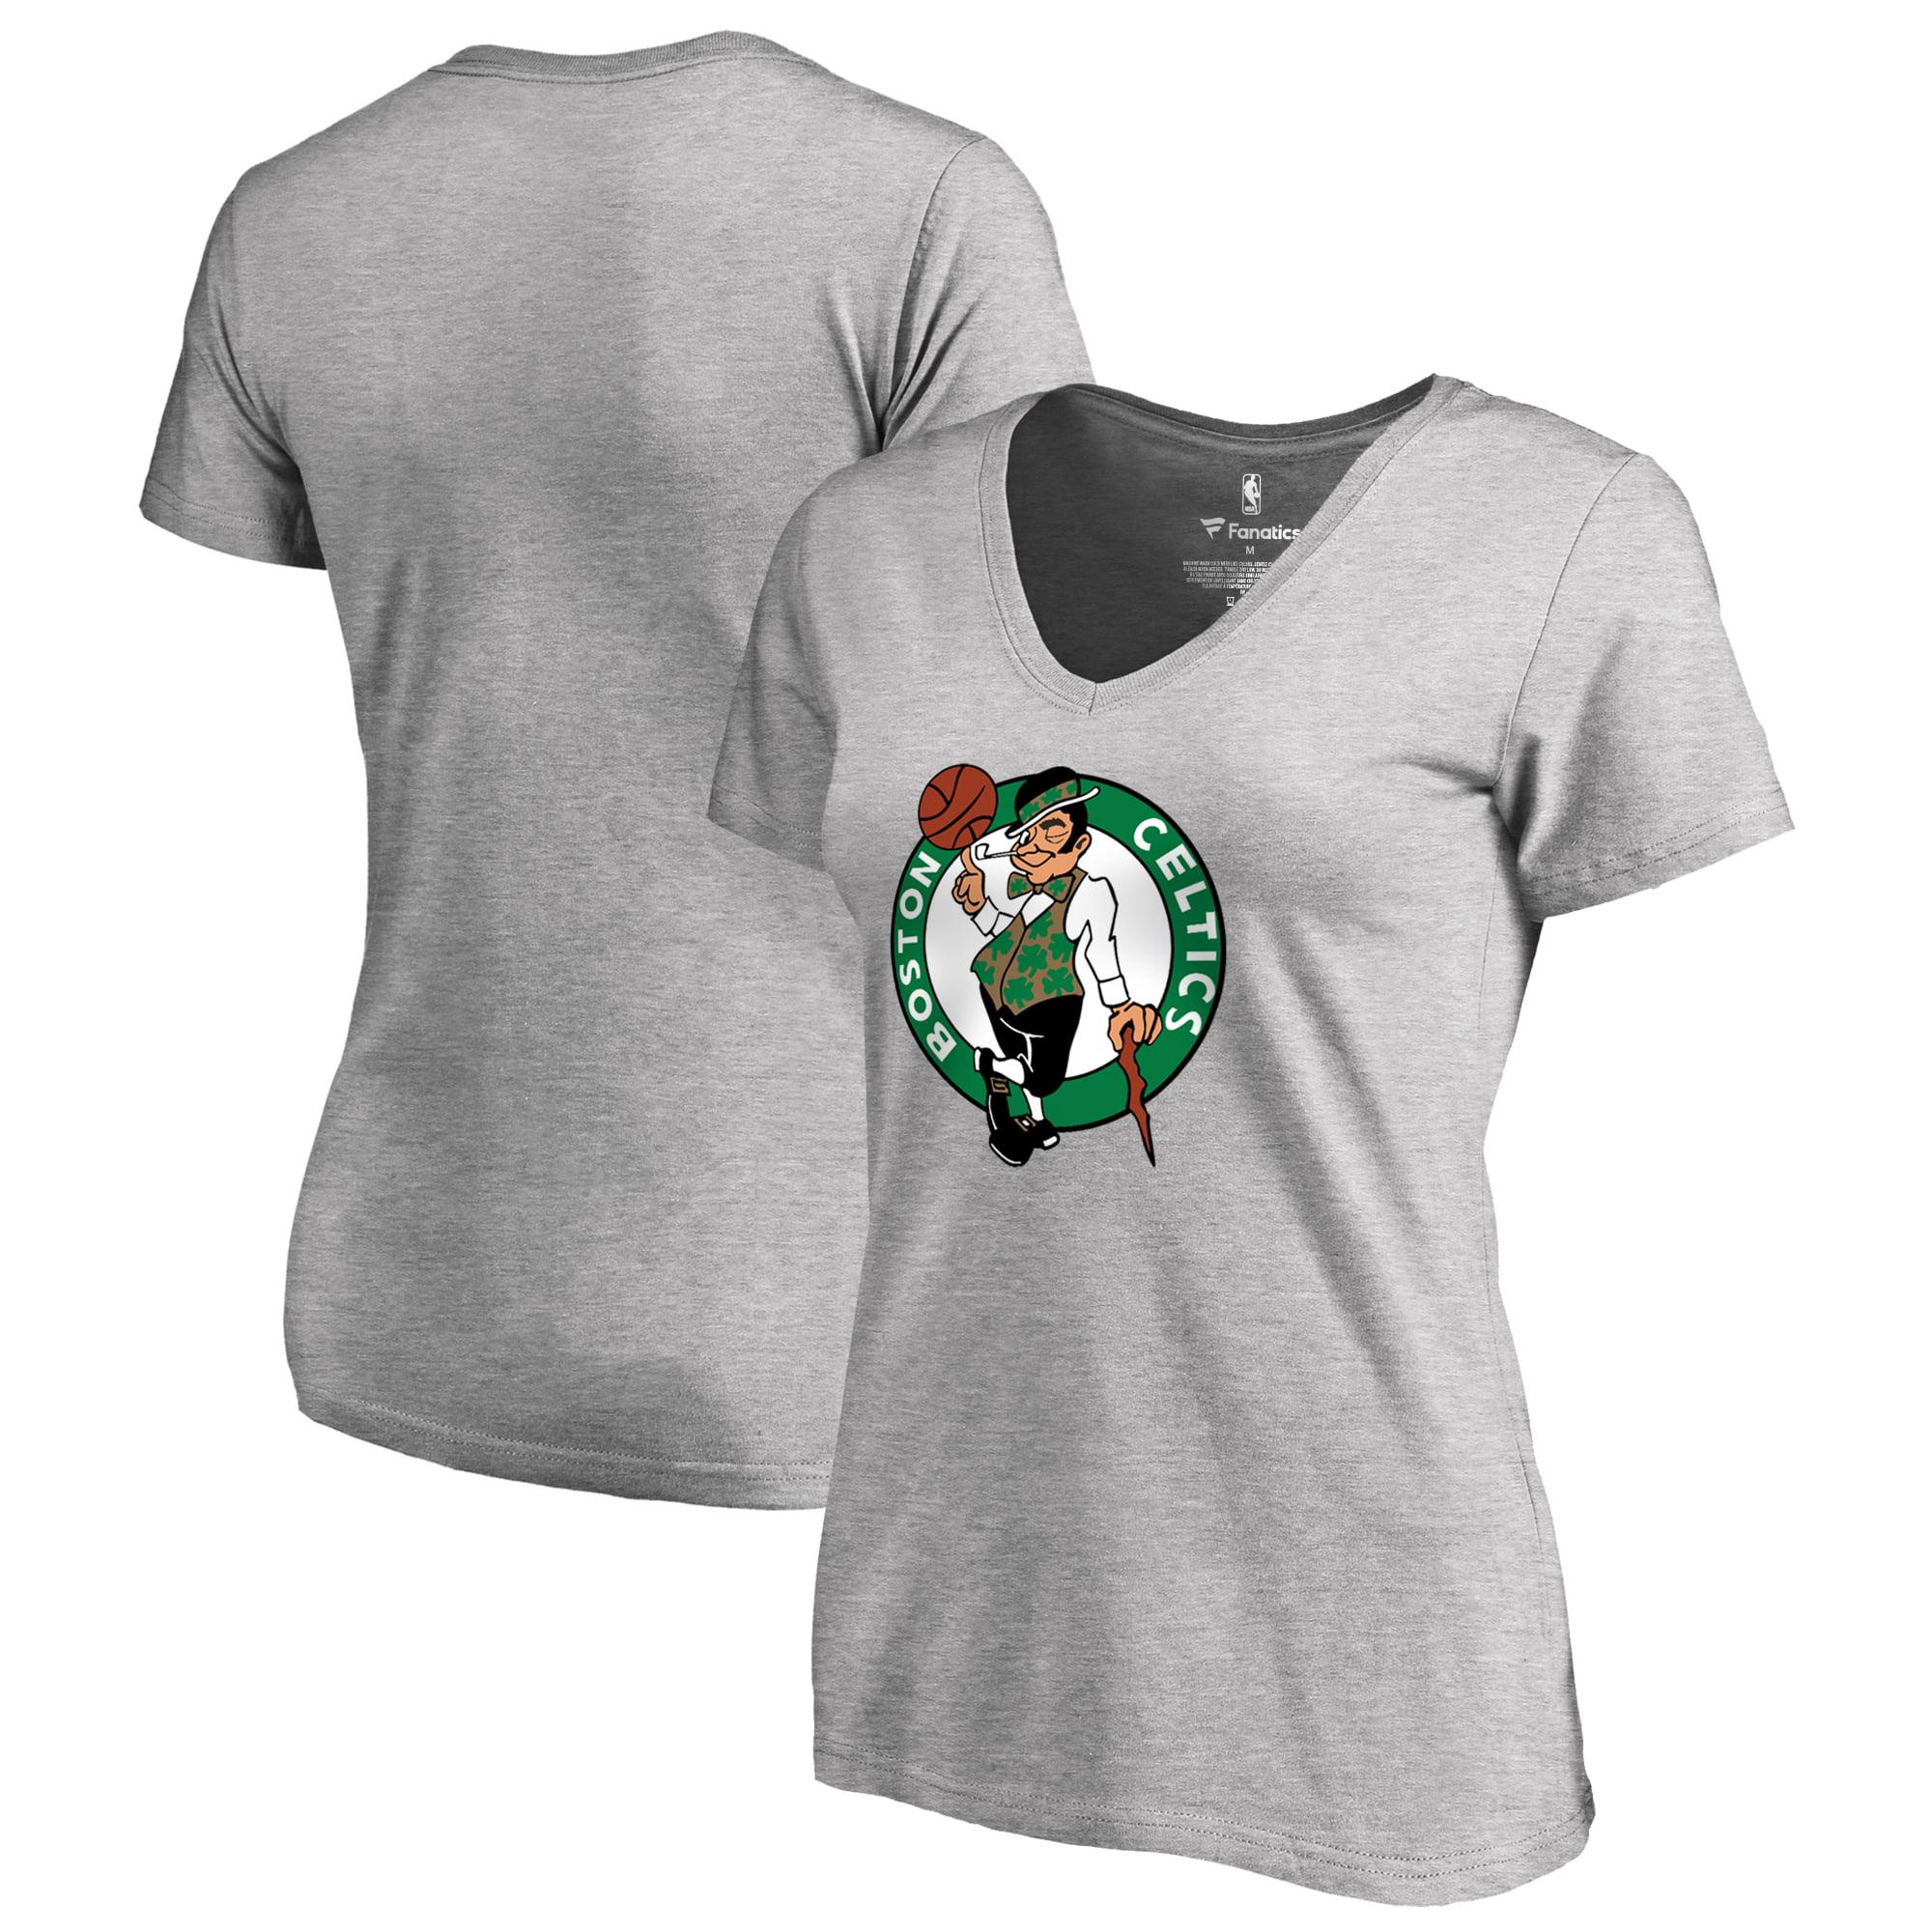 Boston Celtics Fanatics Branded Women's Plus Size Primary Logo V-Neck T-Shirt - Heathered Gray